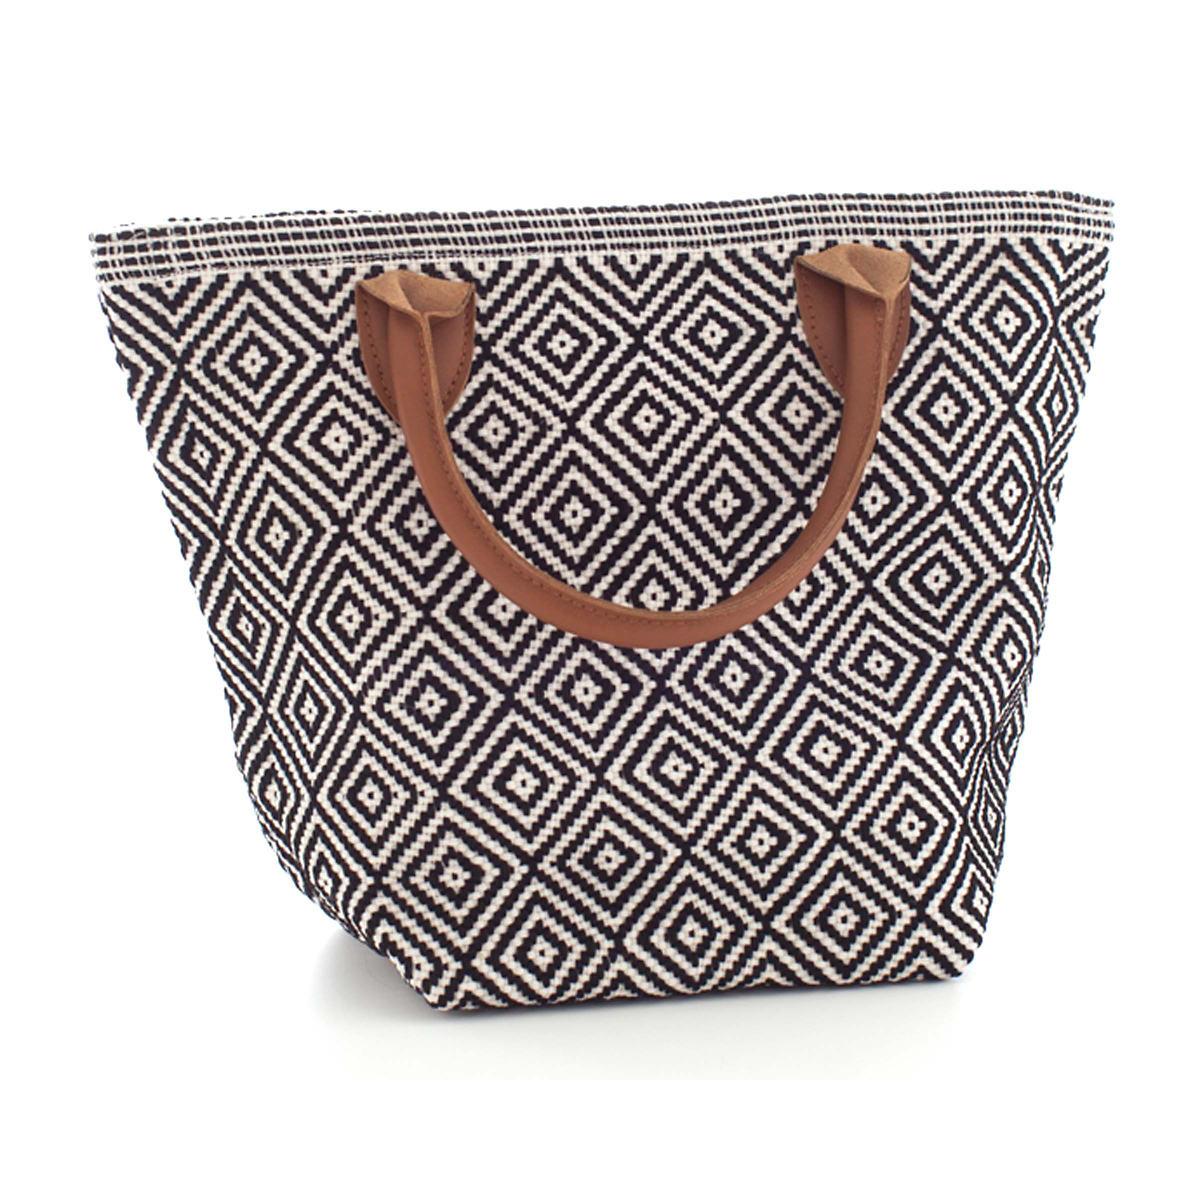 Fresh American Le Tote Black/Ivory Tote Bag Petit